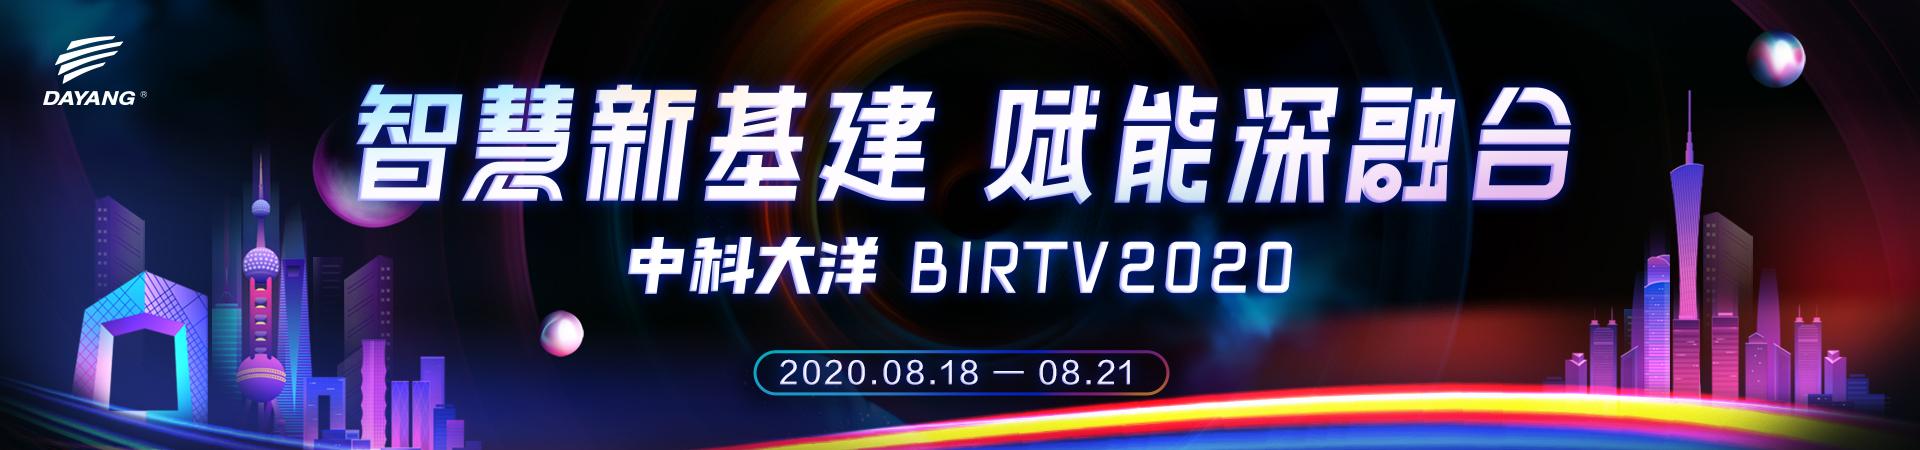 BIRTV2020 | C位出道,high翻全场!中科大洋的这场直播必须上头条!